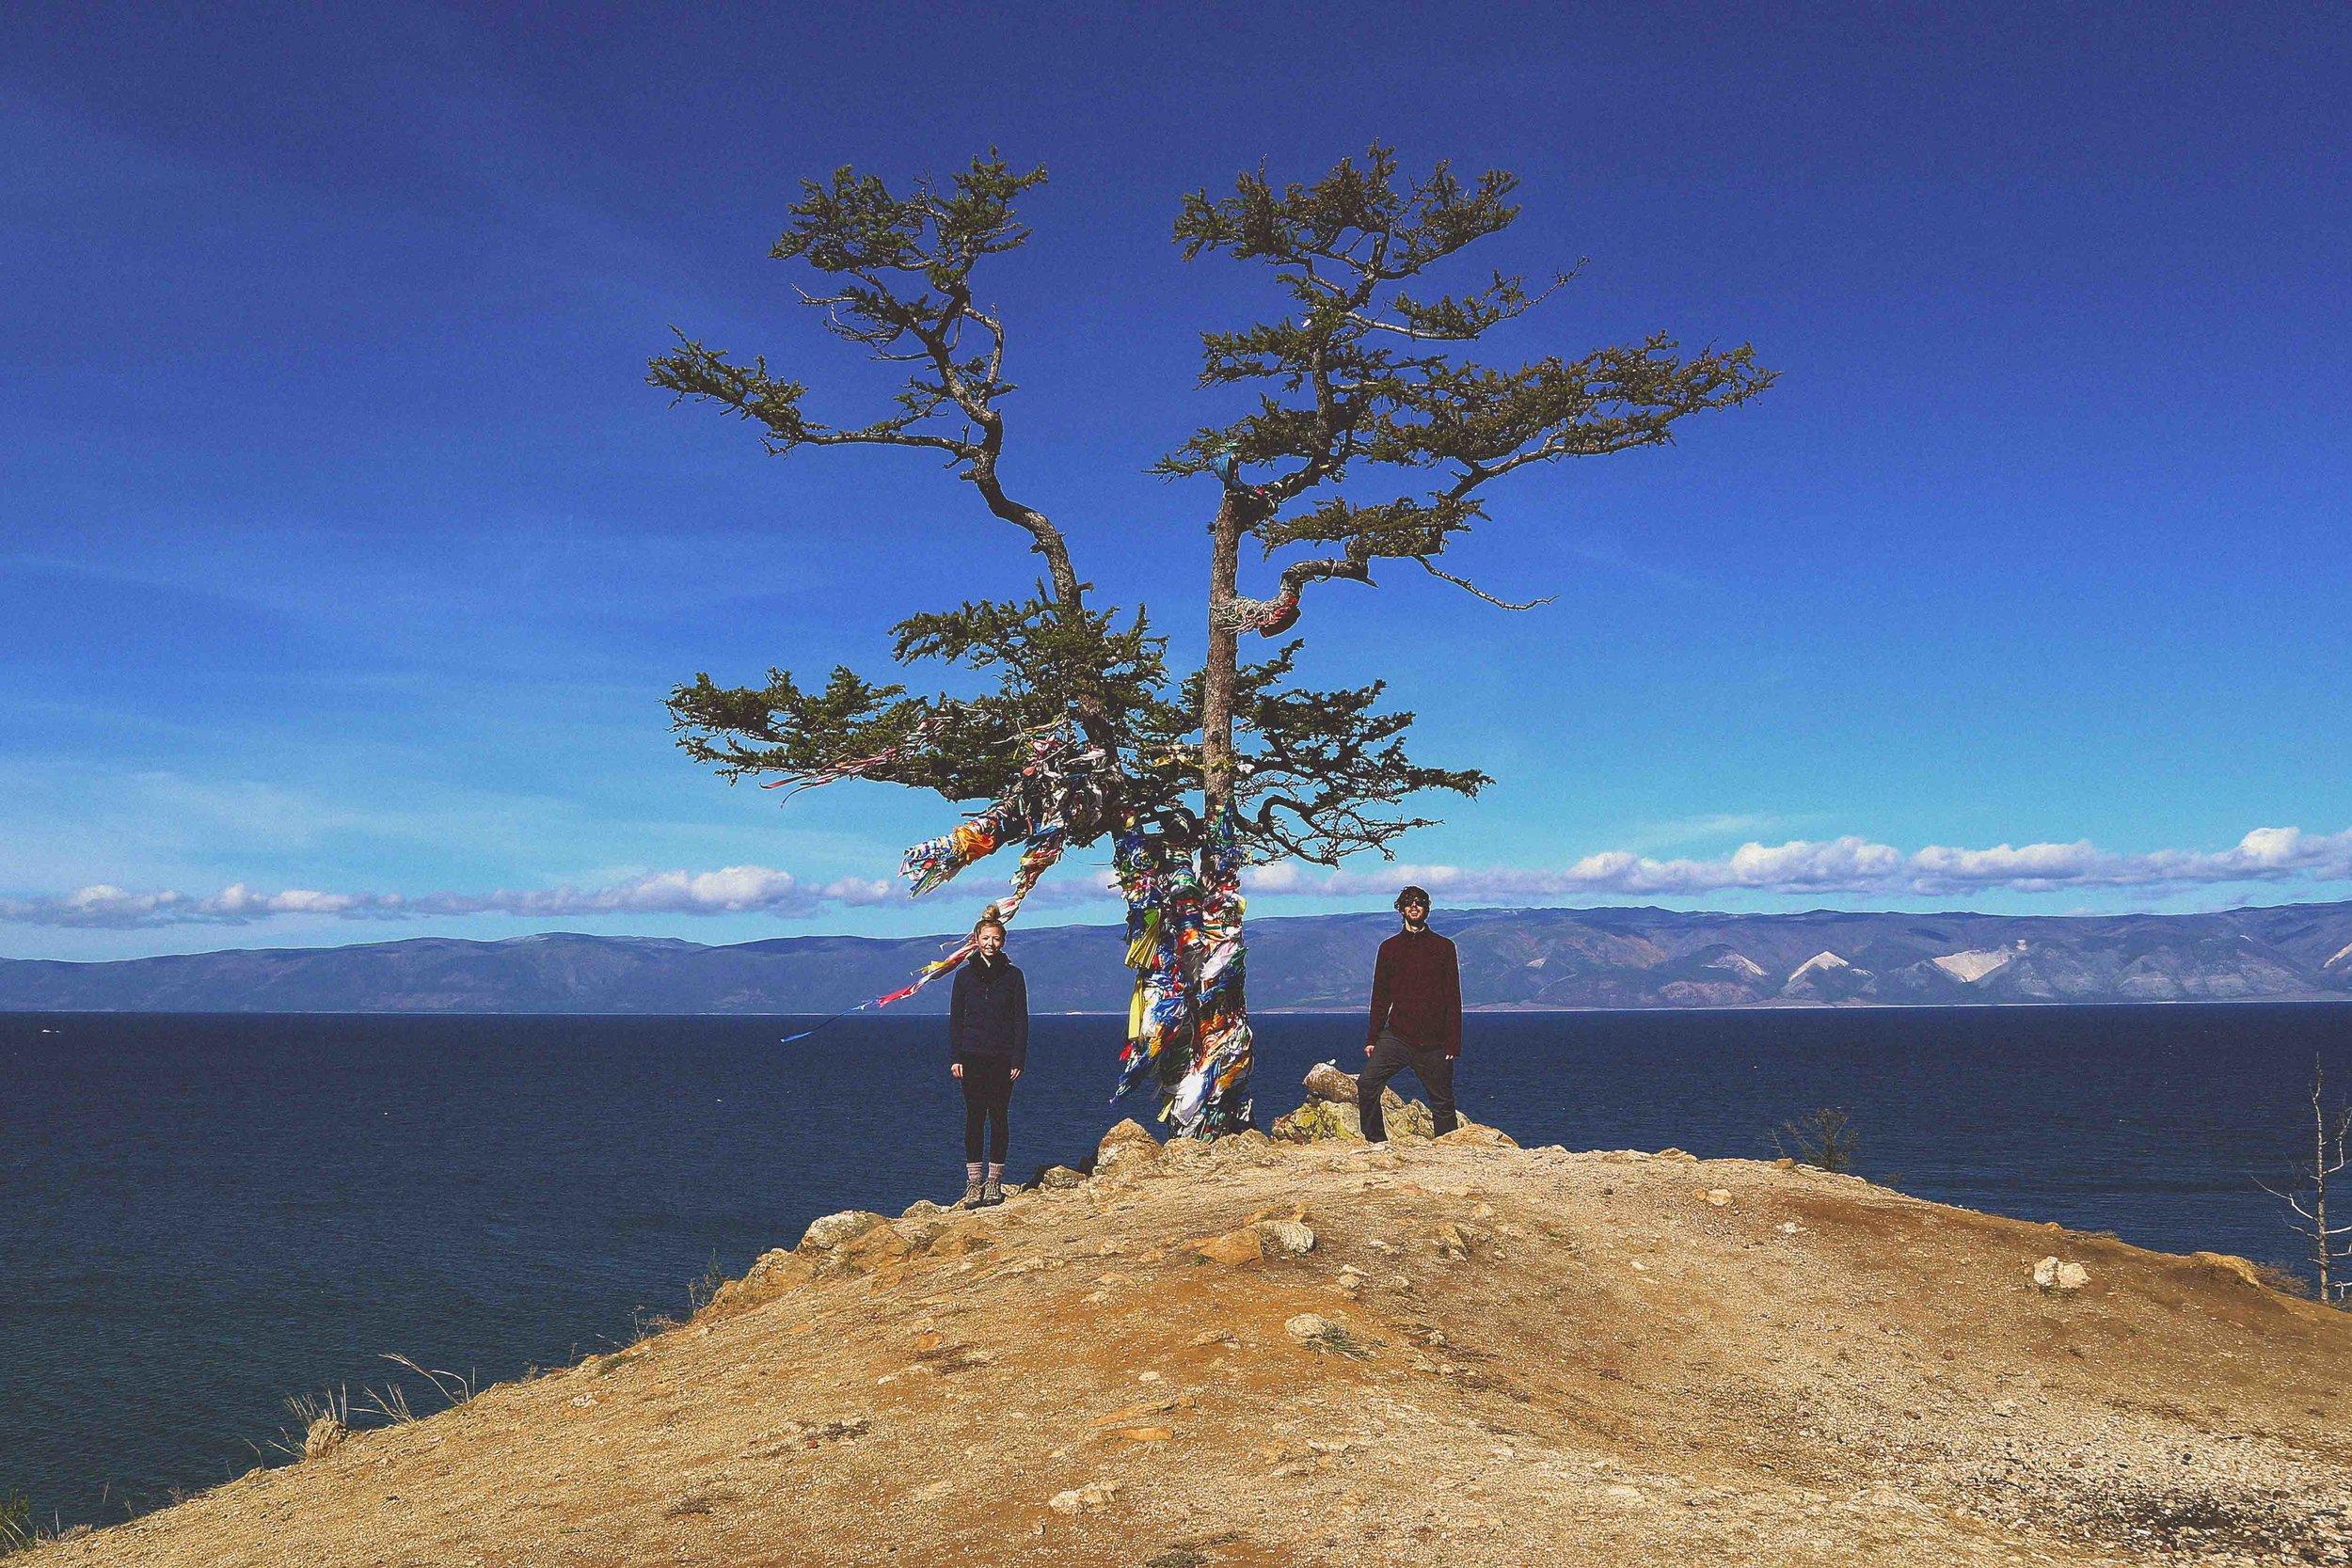 A shamanic tree on Olkhon Island (lake Baikal), Siberia, Russia